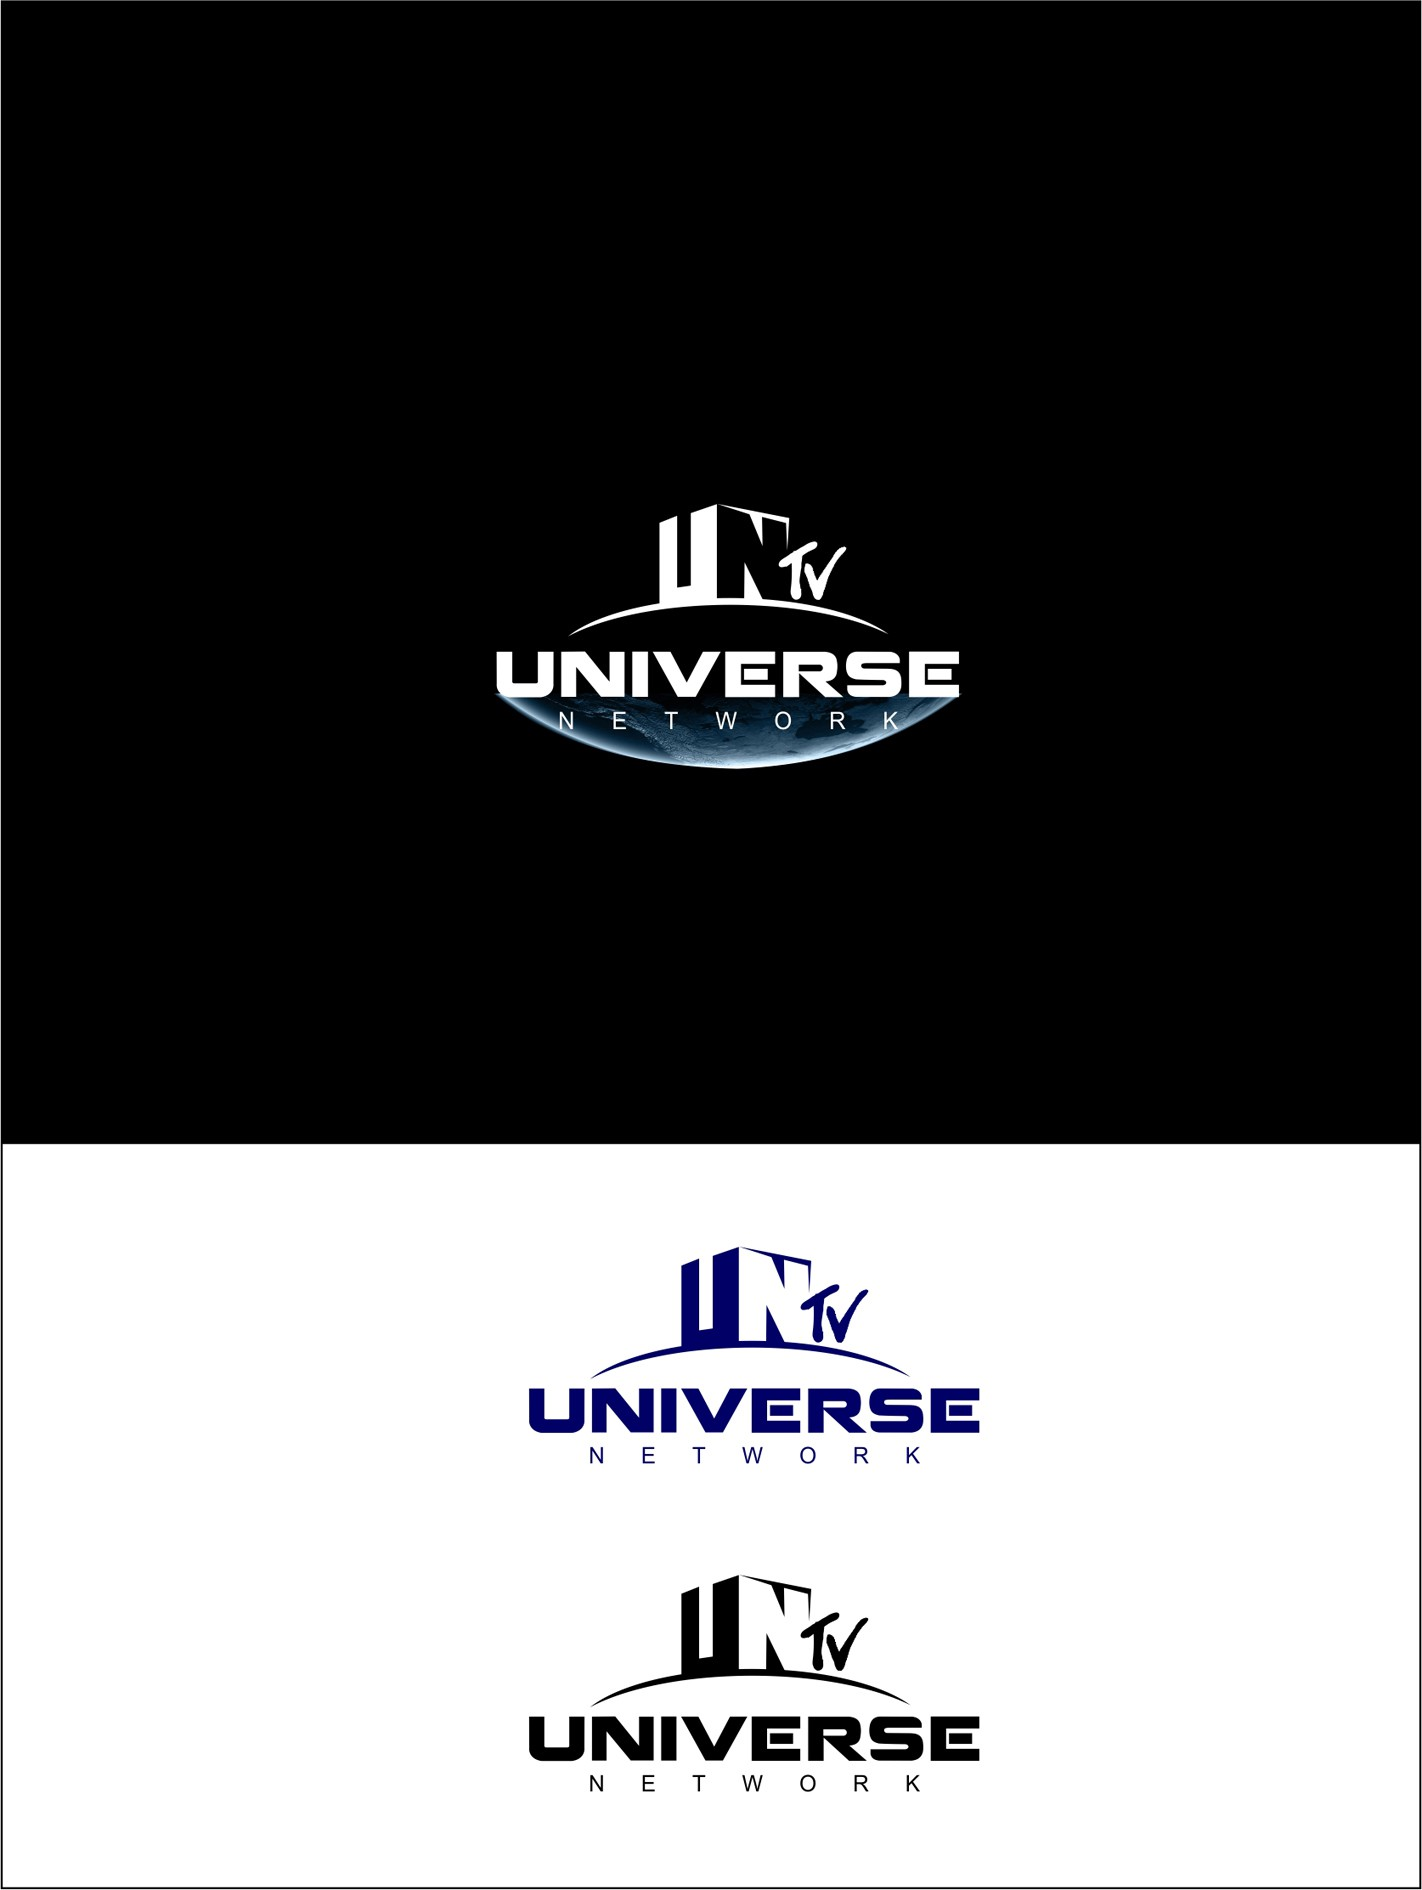 Universe Network (Television) - UNTV